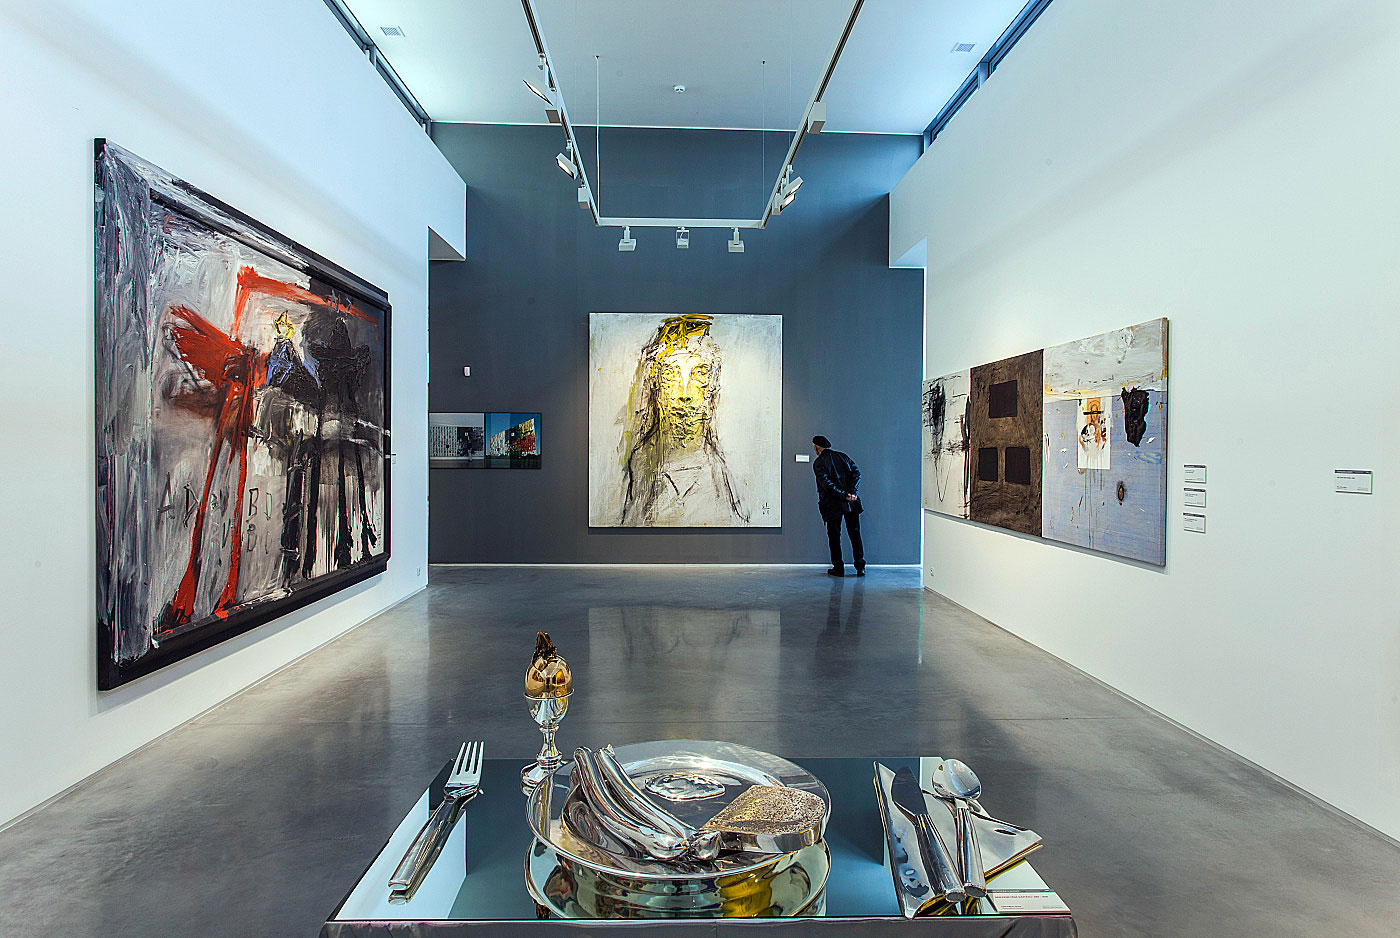 Pantrac gross  eur erco danubiana meulensteen art museum report 9 2